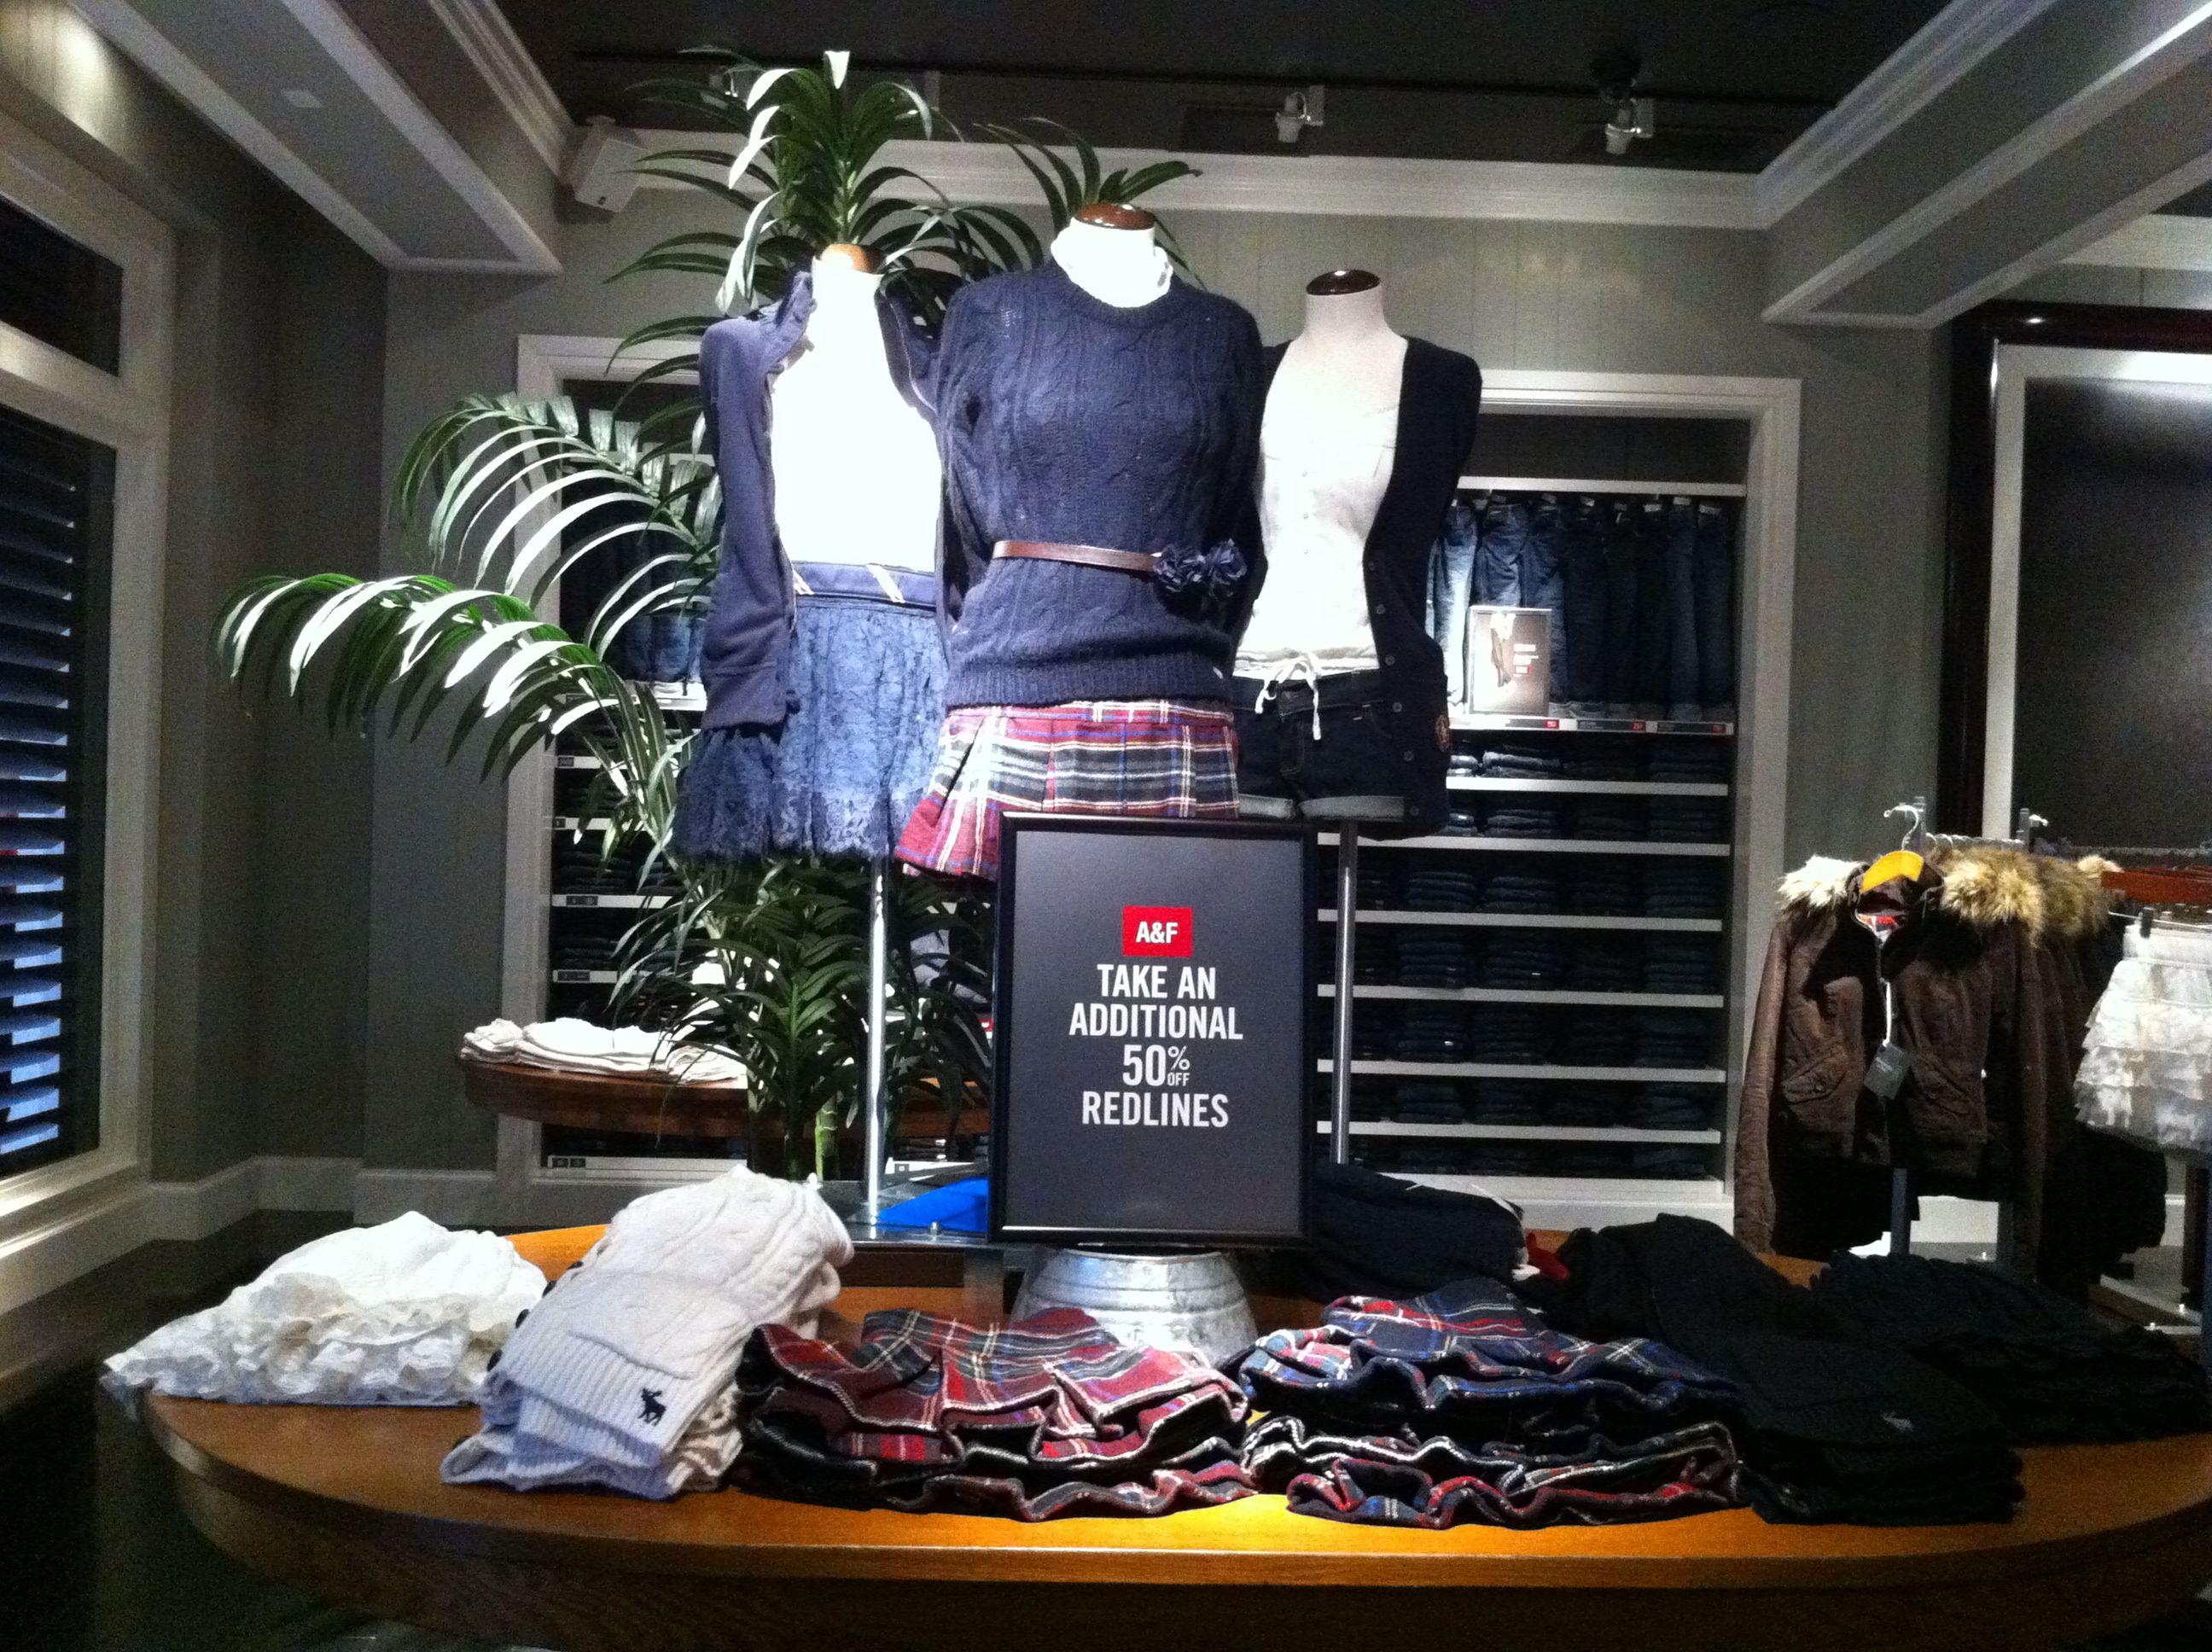 Shop, shop till I drop | Retail concepts, Price signage ...